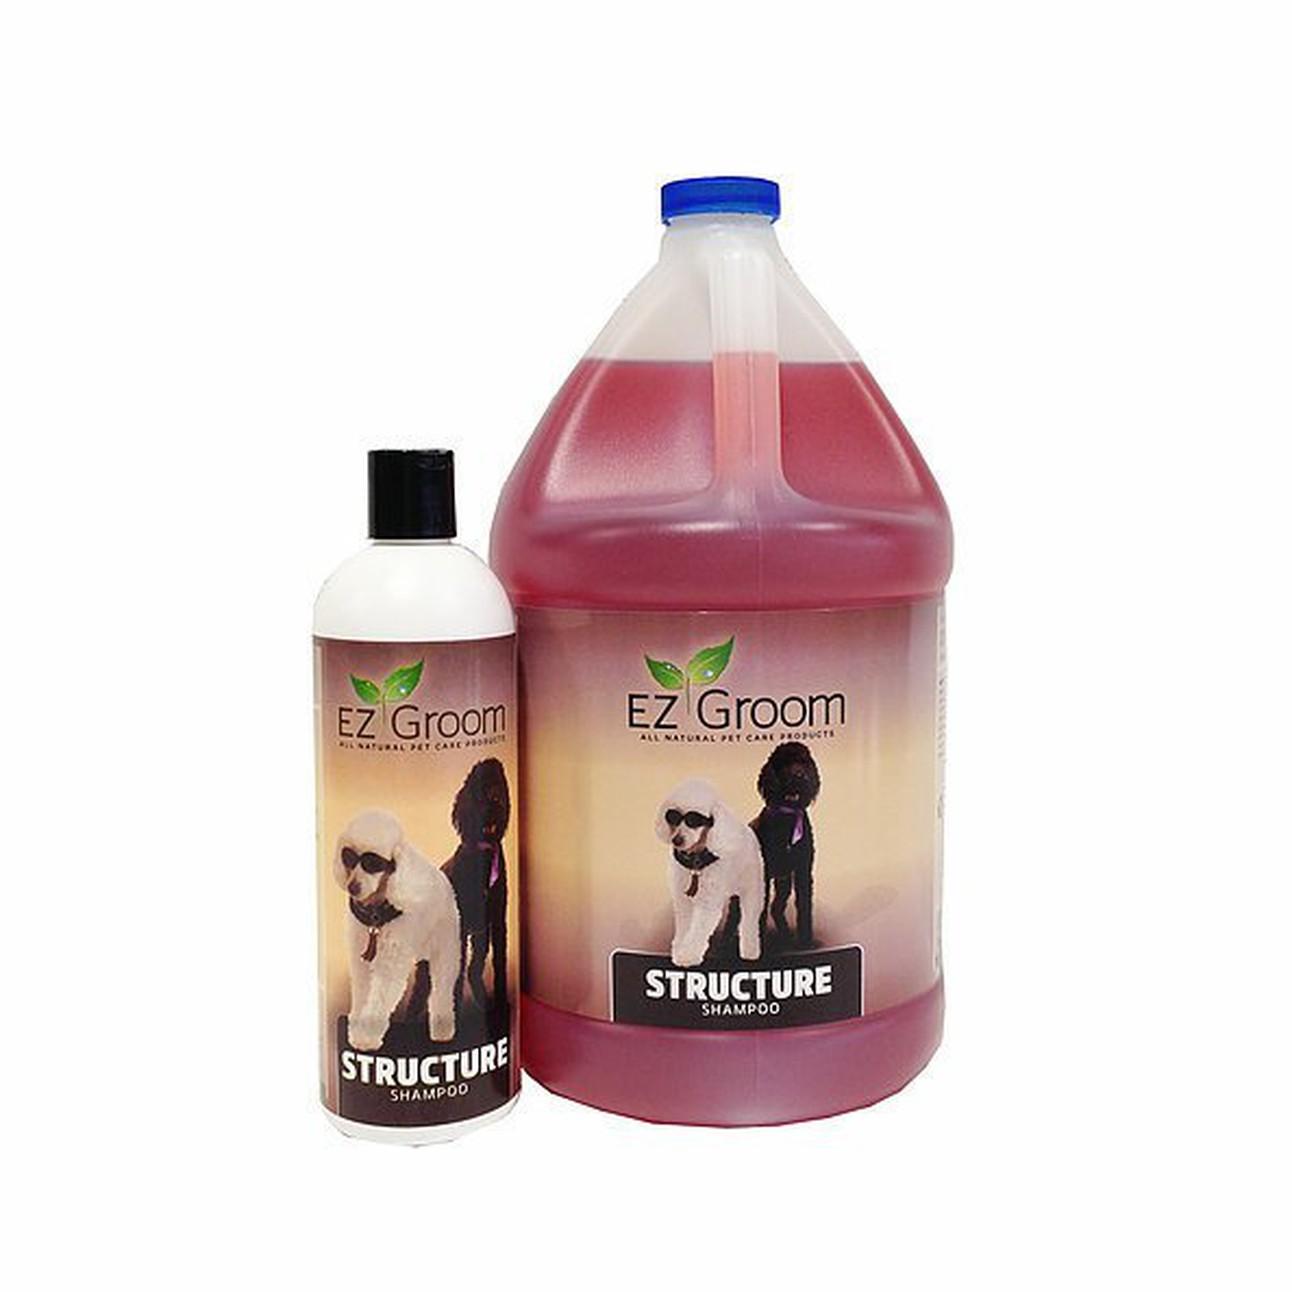 EZ Groom Structure Shampoo